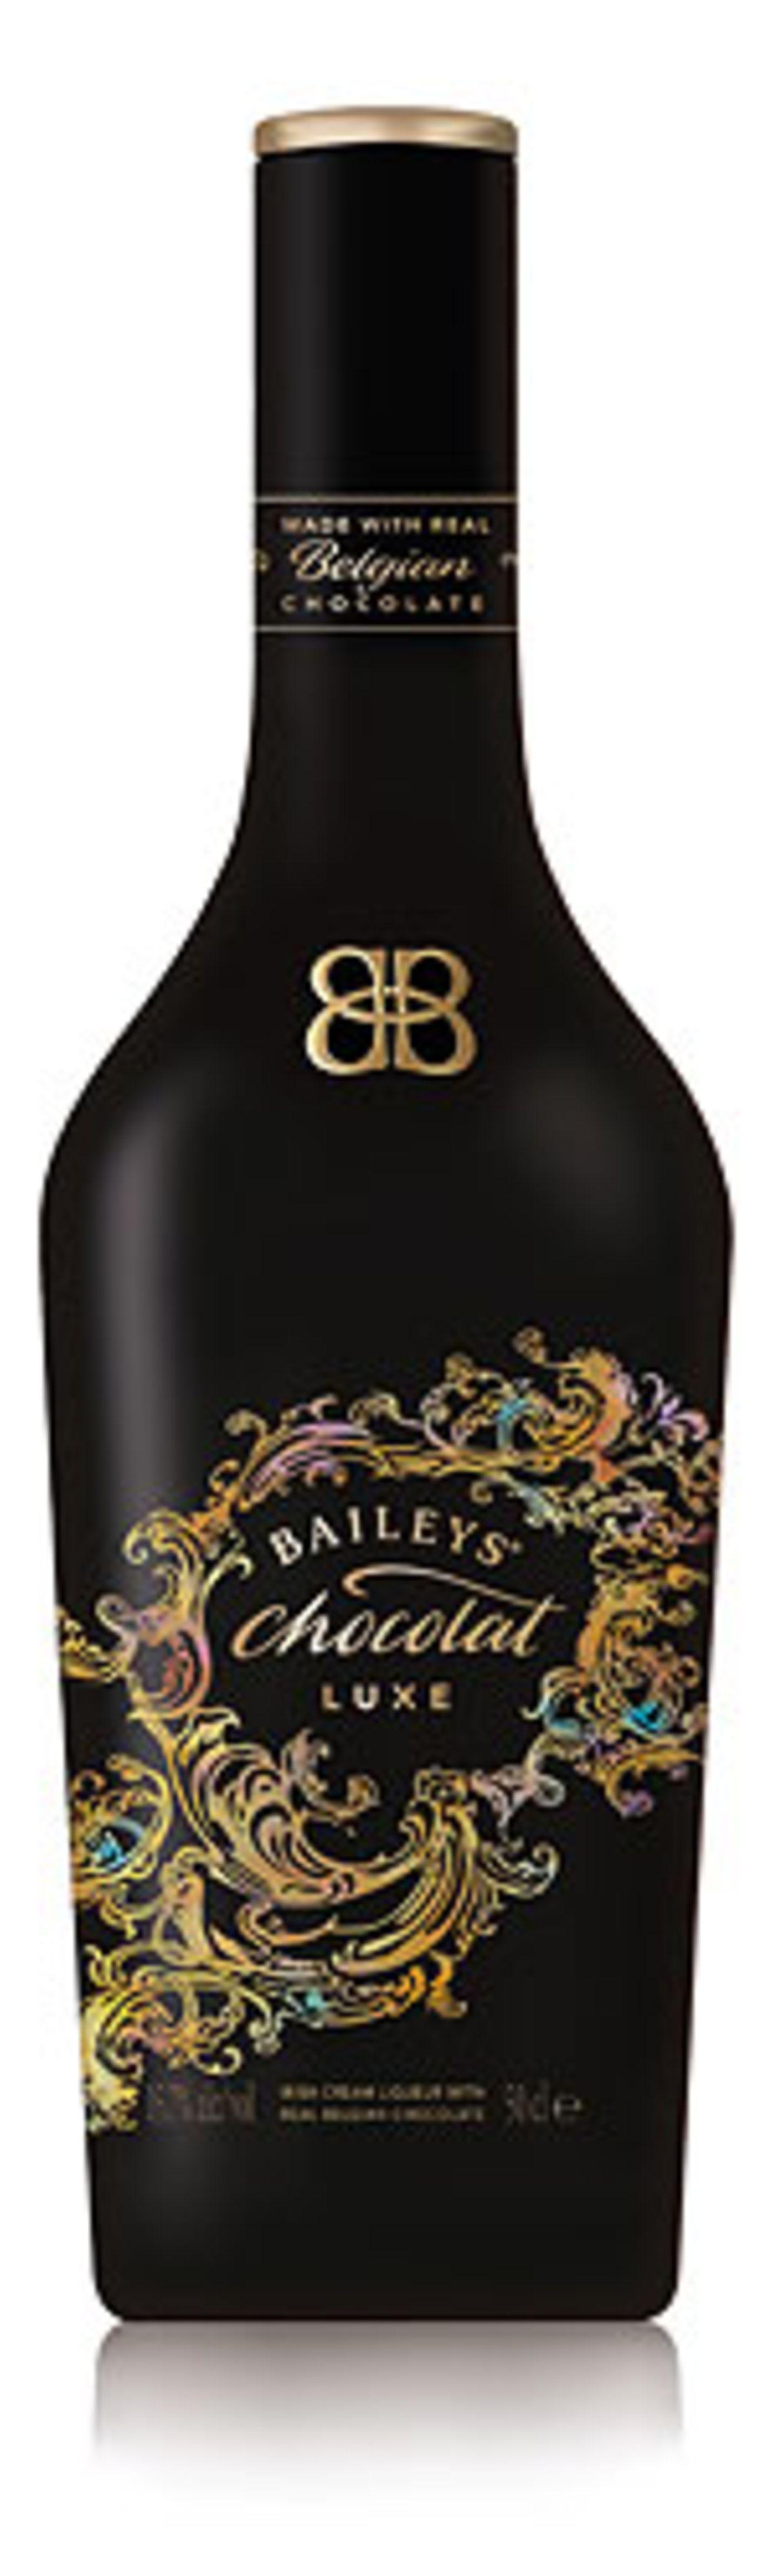 Bailey's Chocolat Luxe